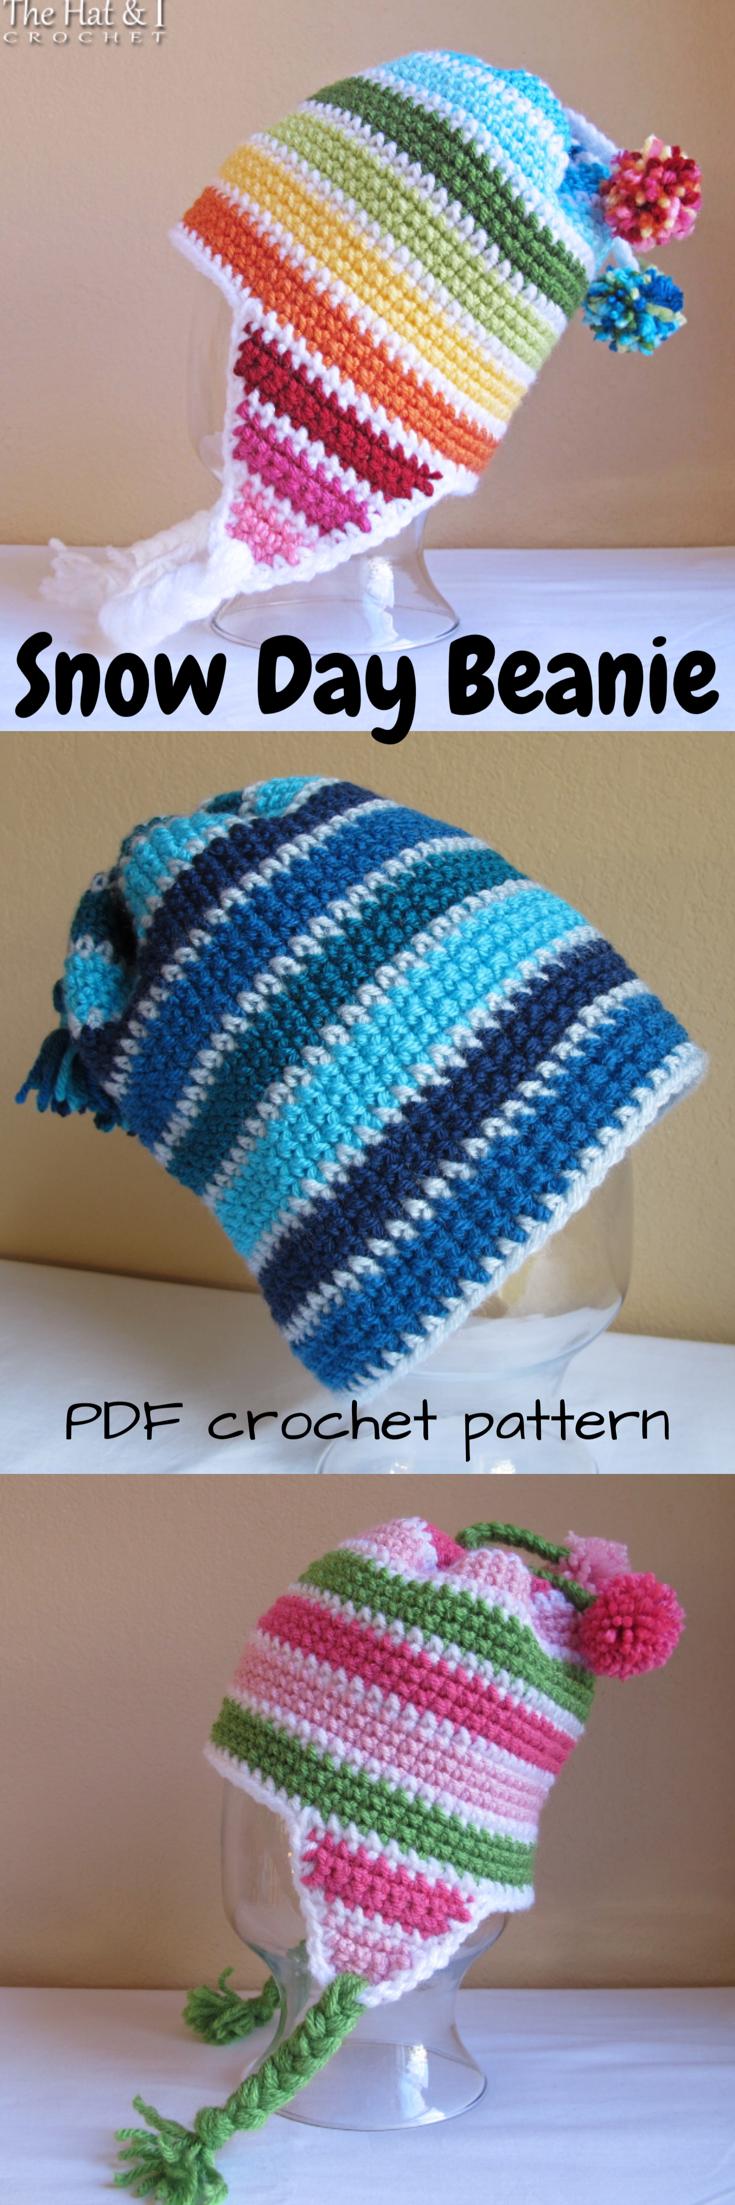 Snow Day Ear Flap Beanie crochet pattern. Adorable PDF pattern for ...